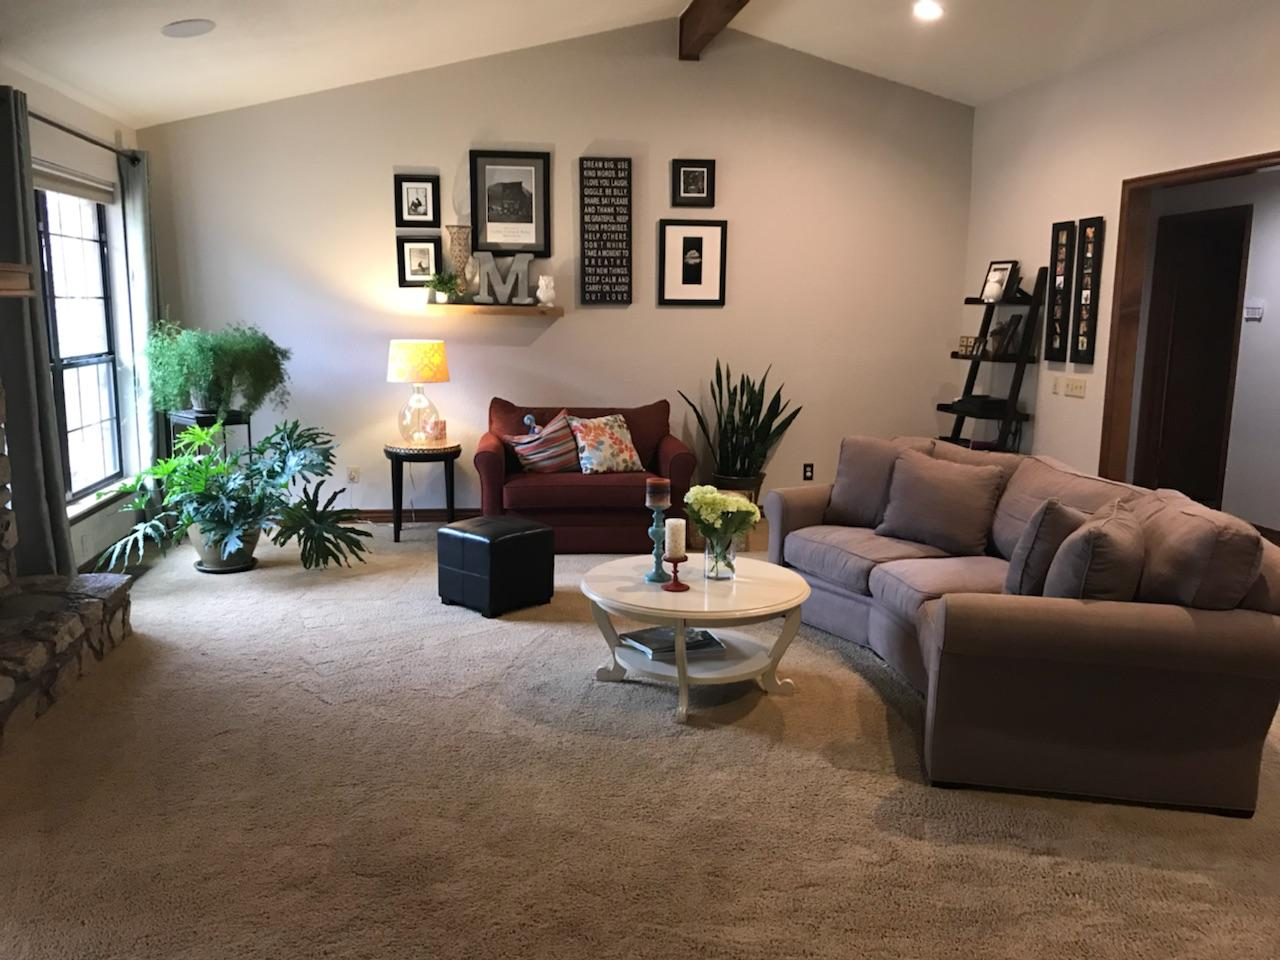 Mikaela living room before.jpeg